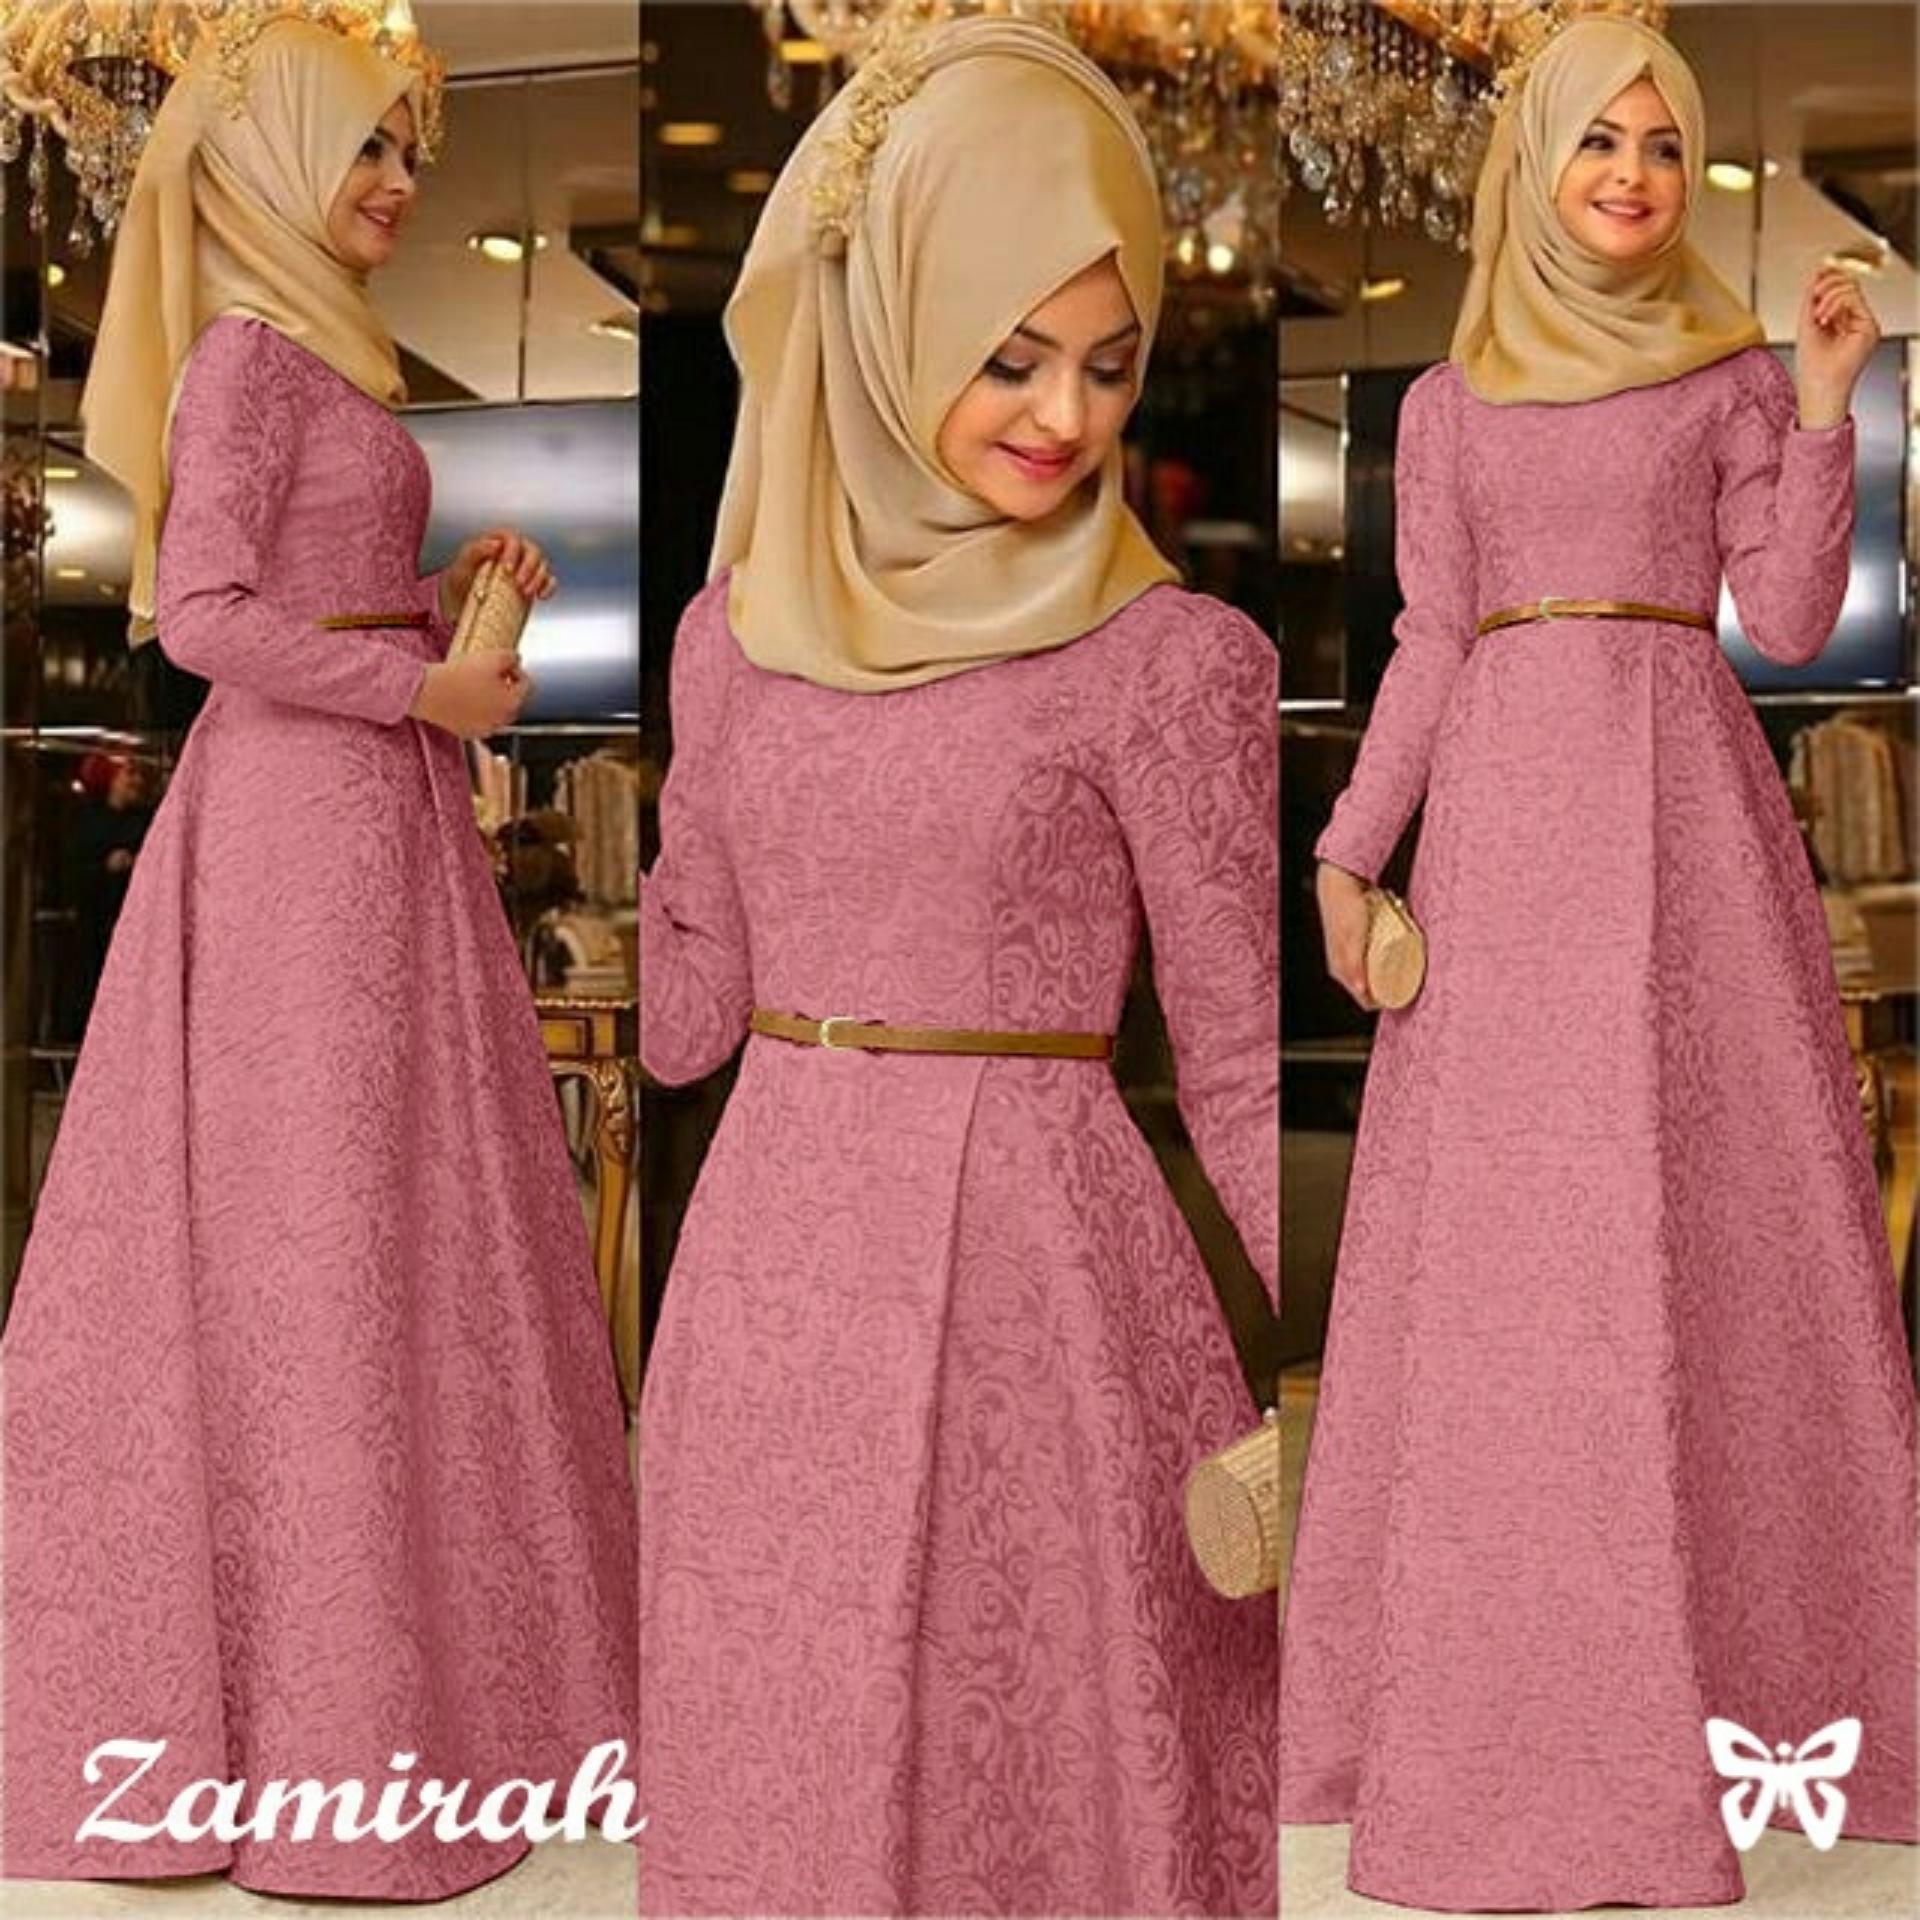 Baju Wanita Shop Dress Gamis Muslim Mirah / Hijab Muslim / Muslim Syari Hijab Syar'i / Busana Muslimah / Kebaya Modern Lebaran (Mirahza)  SS - Dusty Pink / Gaun Pesta Lengan panjang 2018